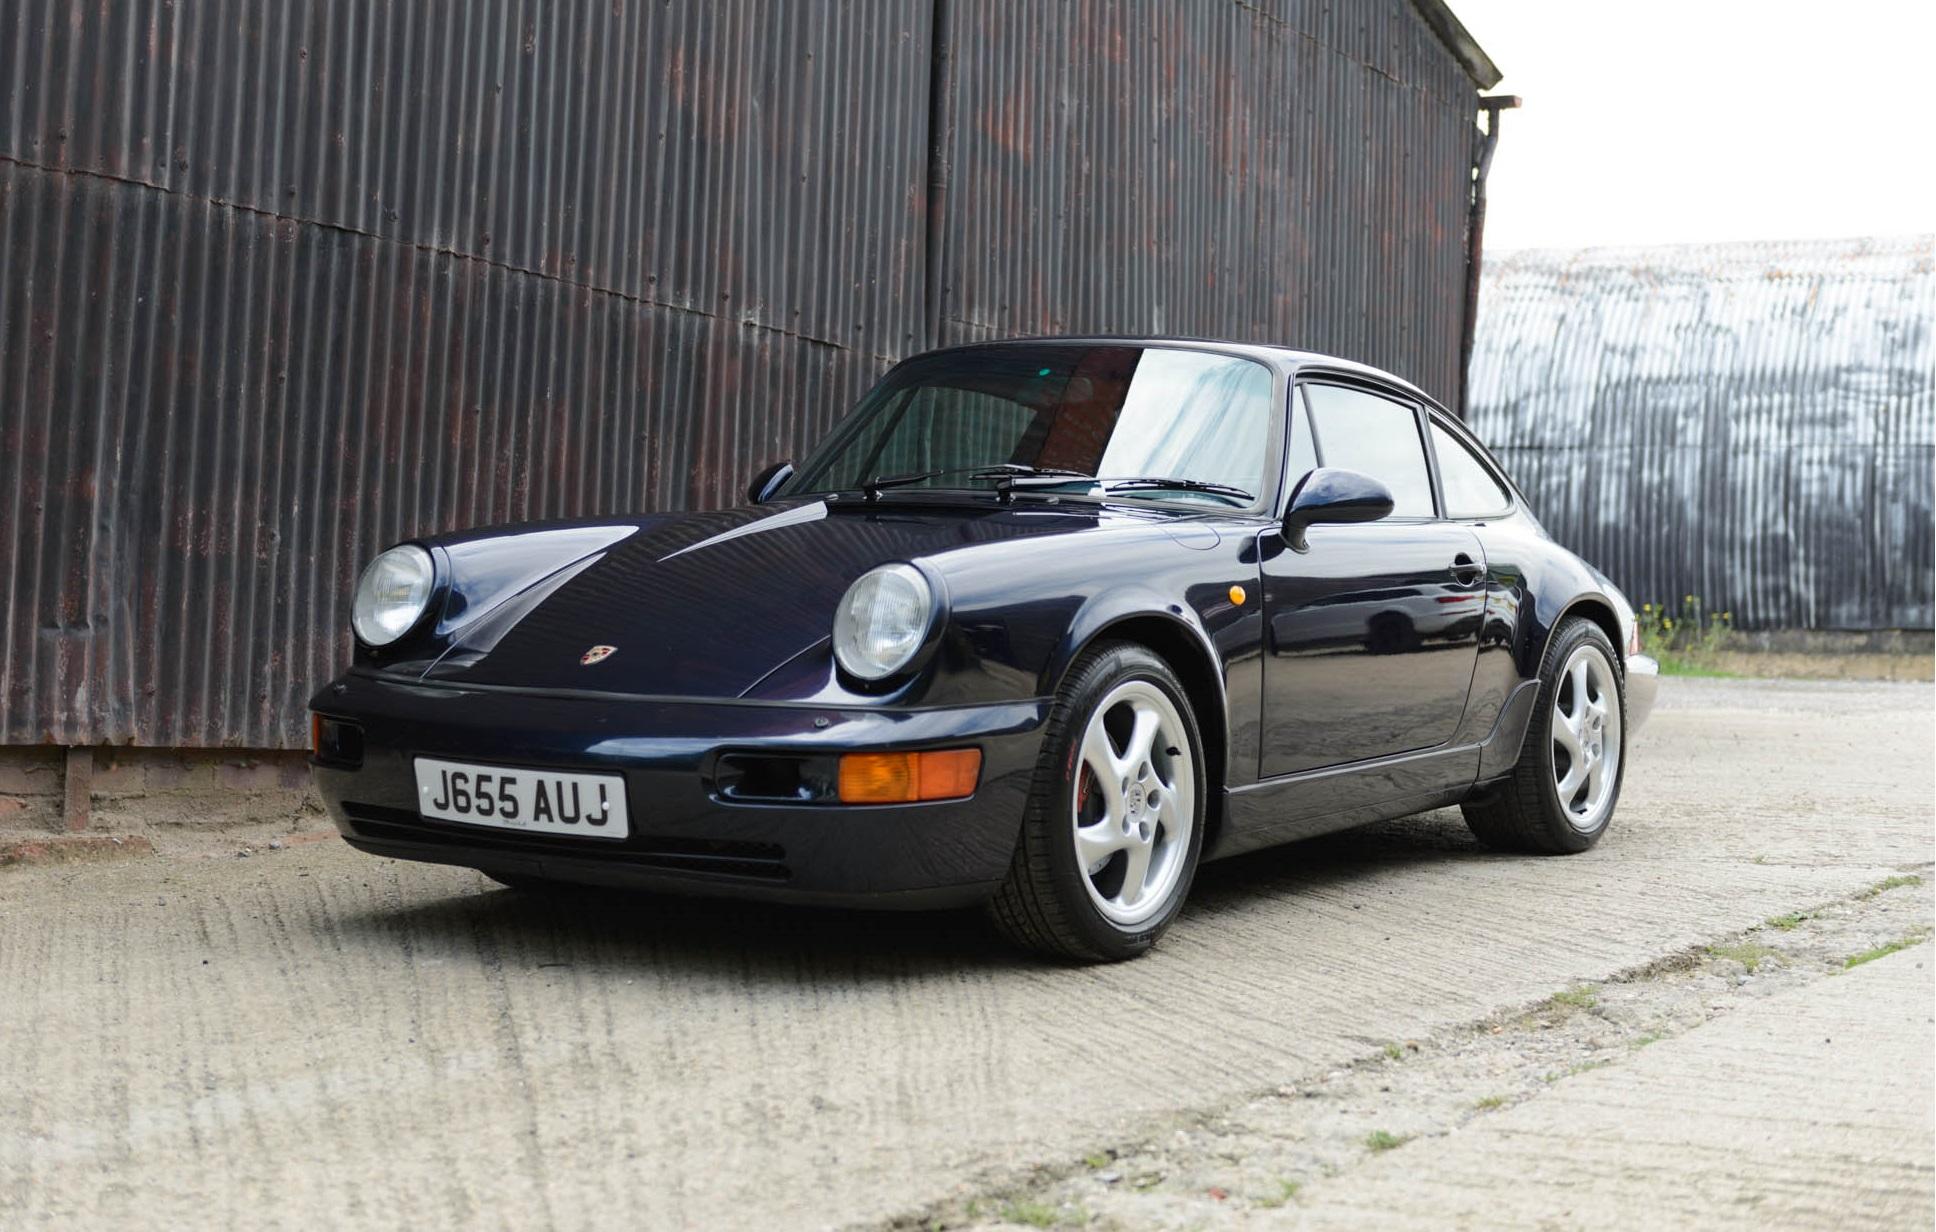 1991 PORSCHE 911 (964) CARRERA 2 TIPTRONIC